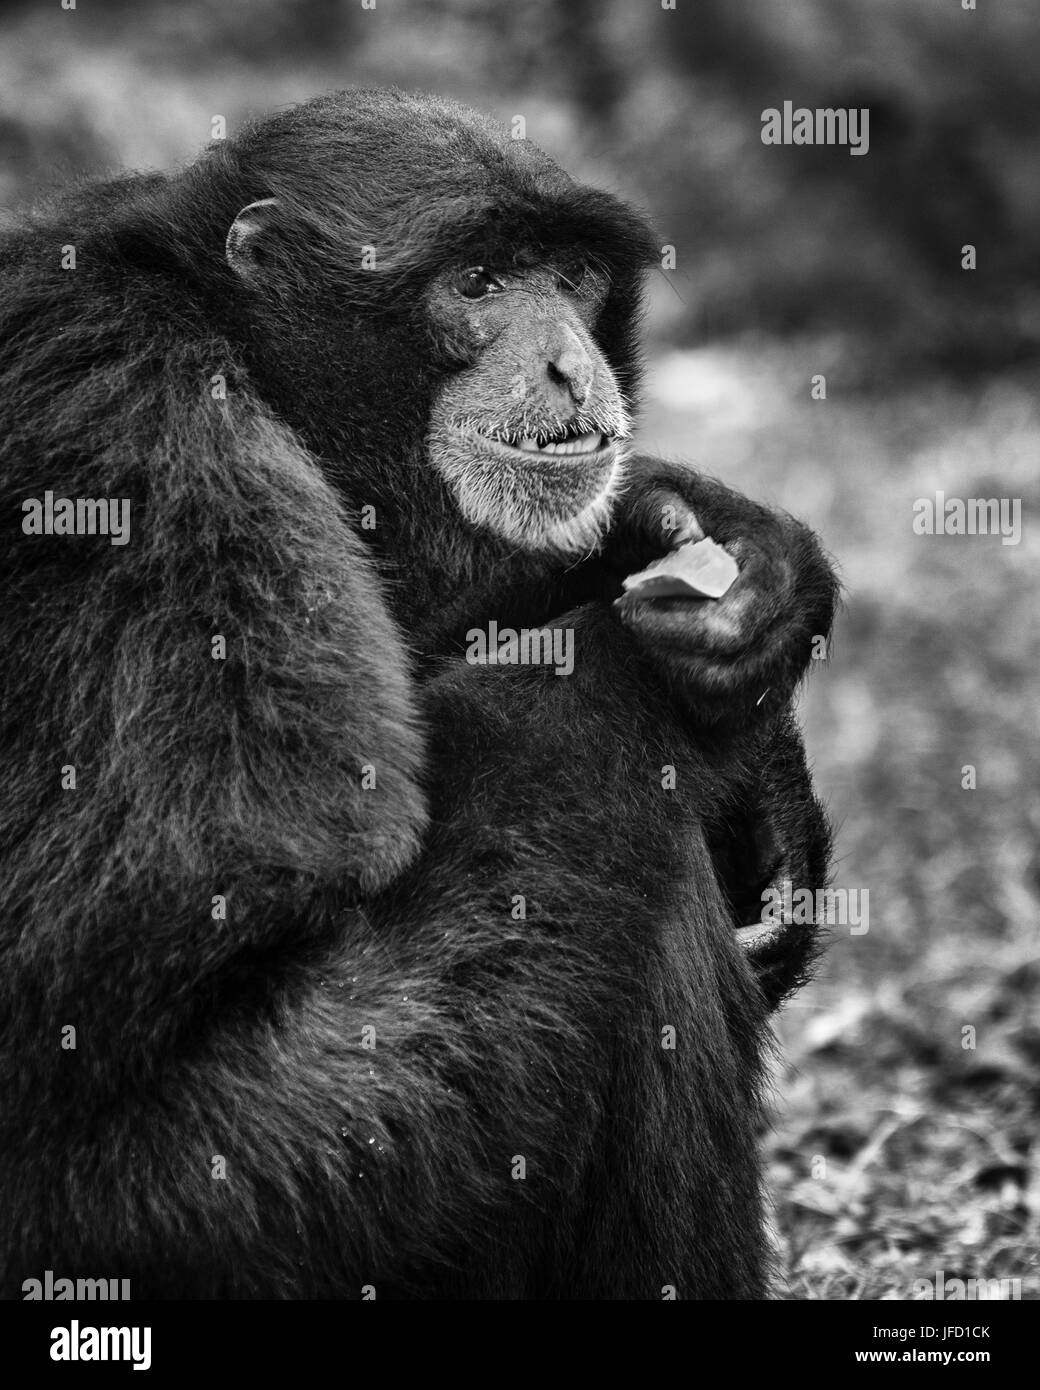 Mueller Gibbon thinking - Stock Image